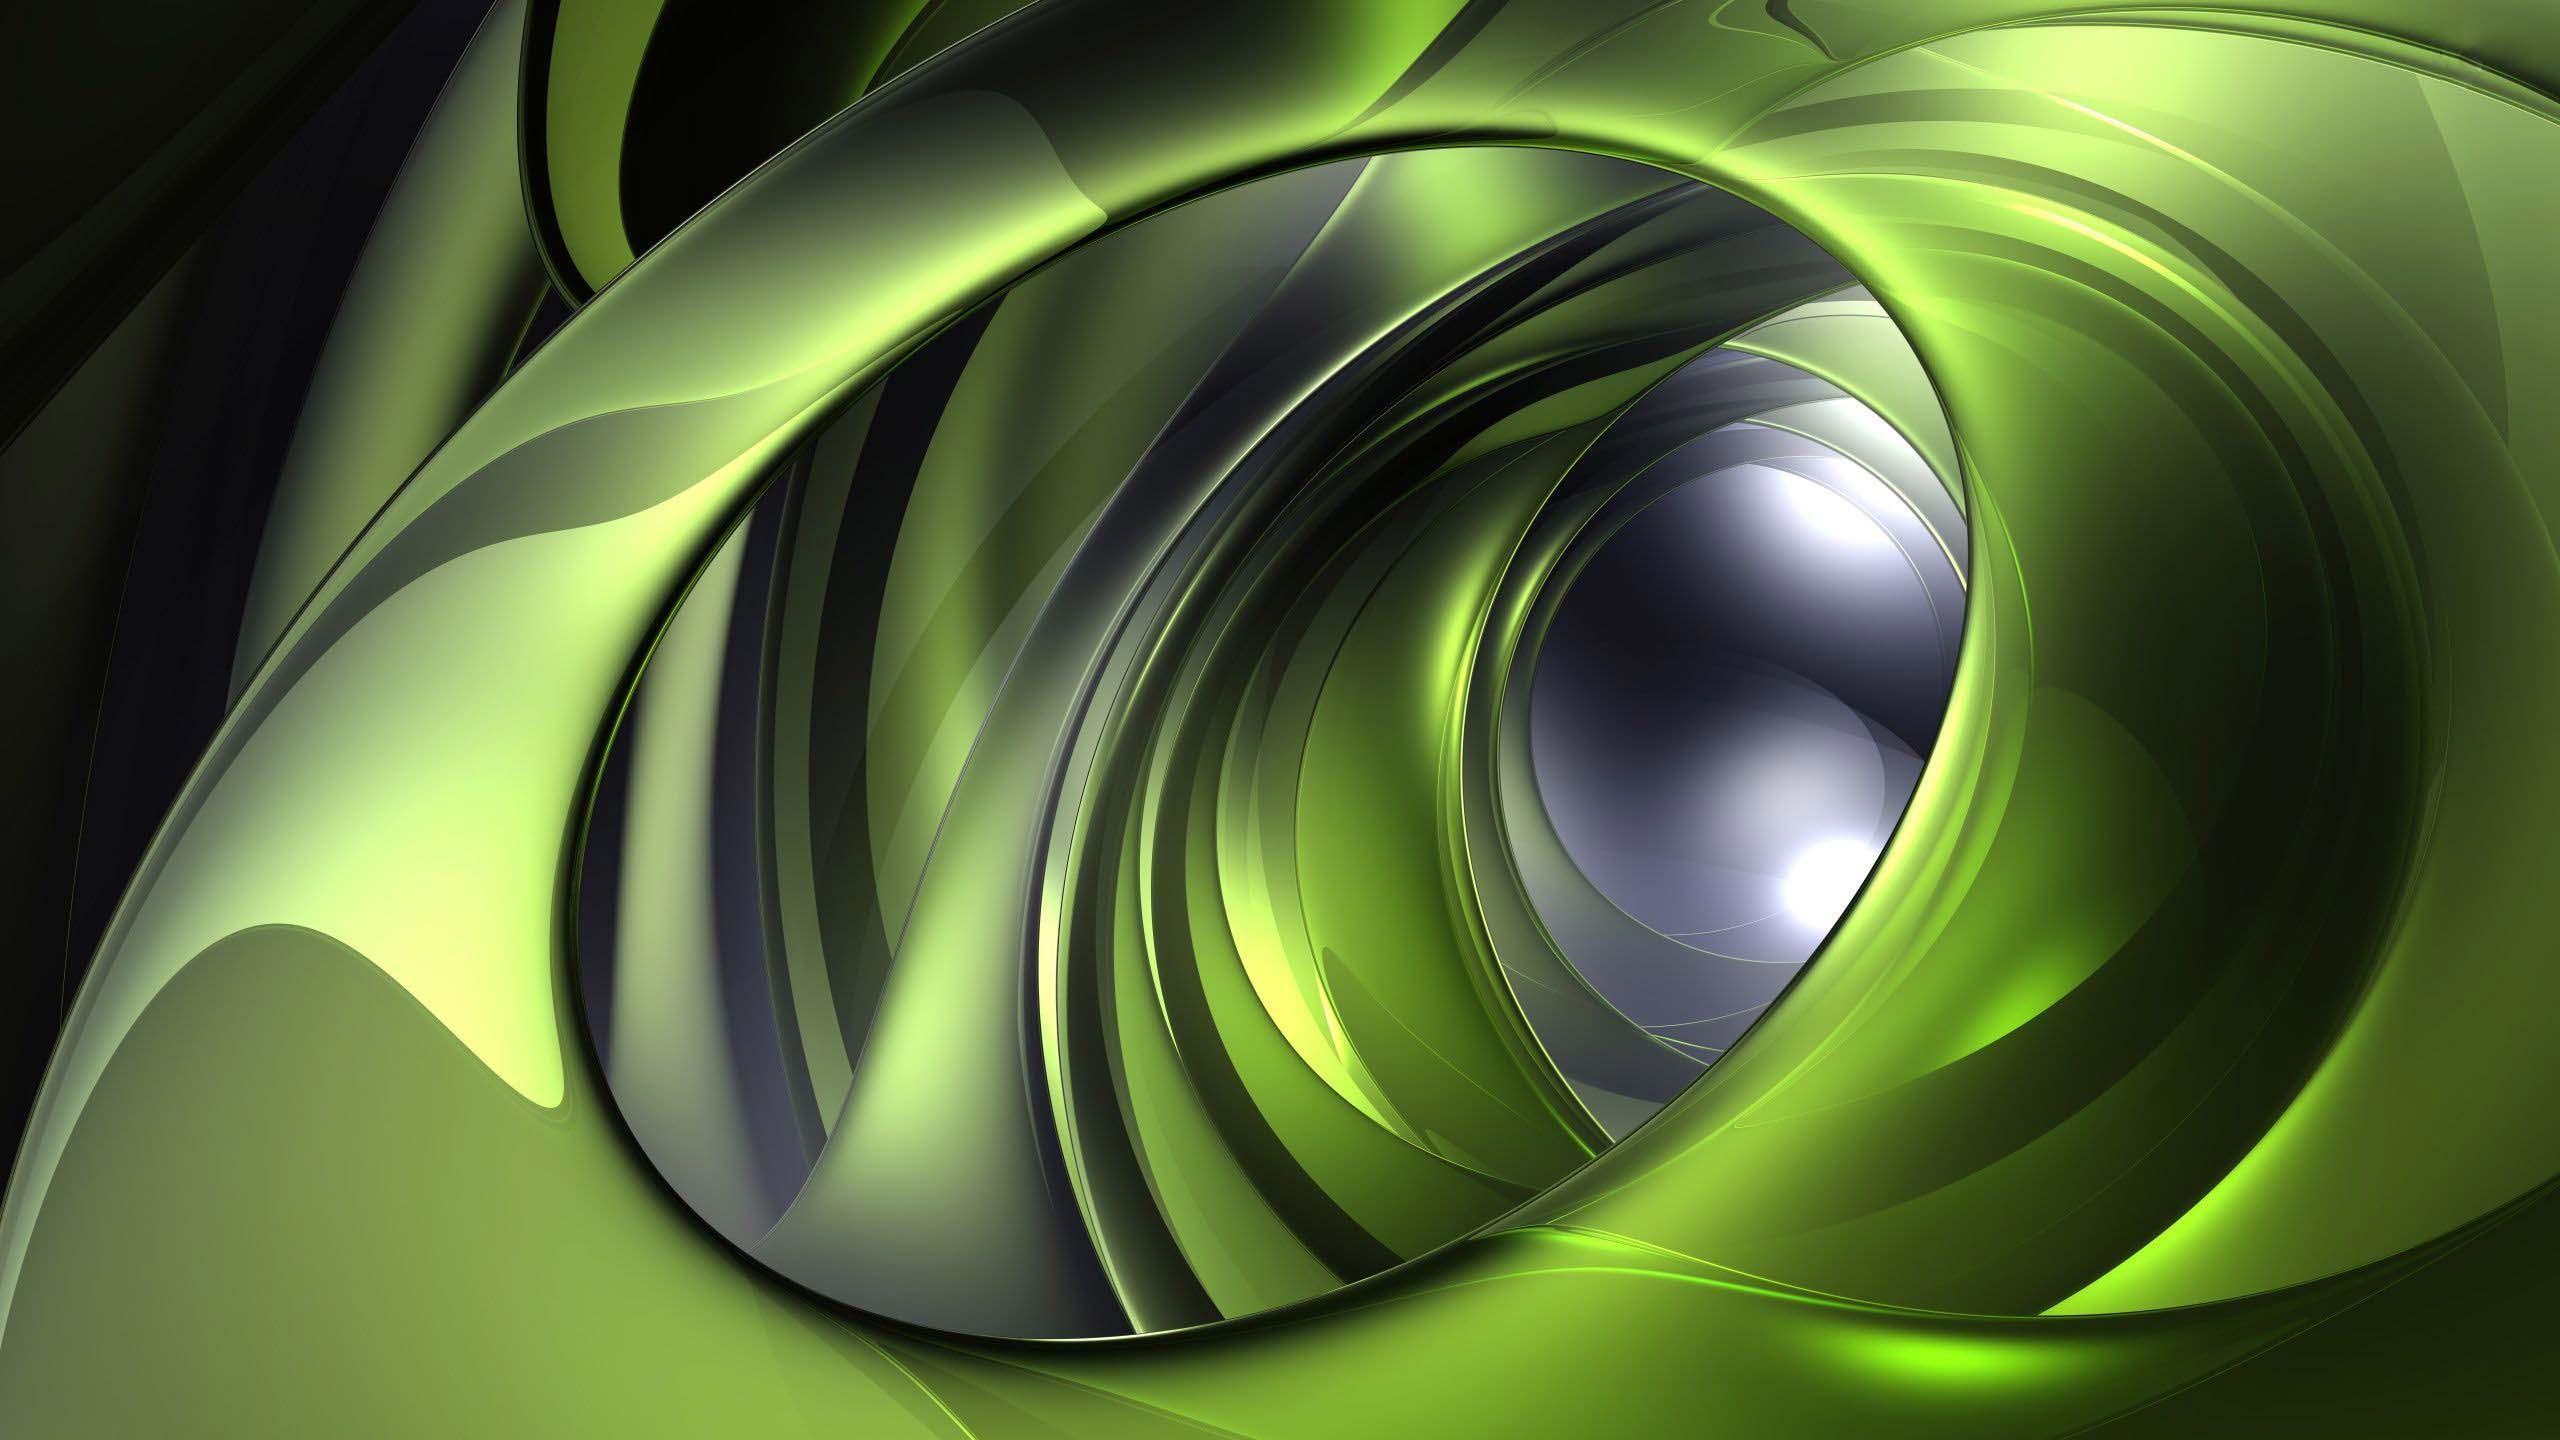 Green metallic circles wallpaper   1360826 2560x1440